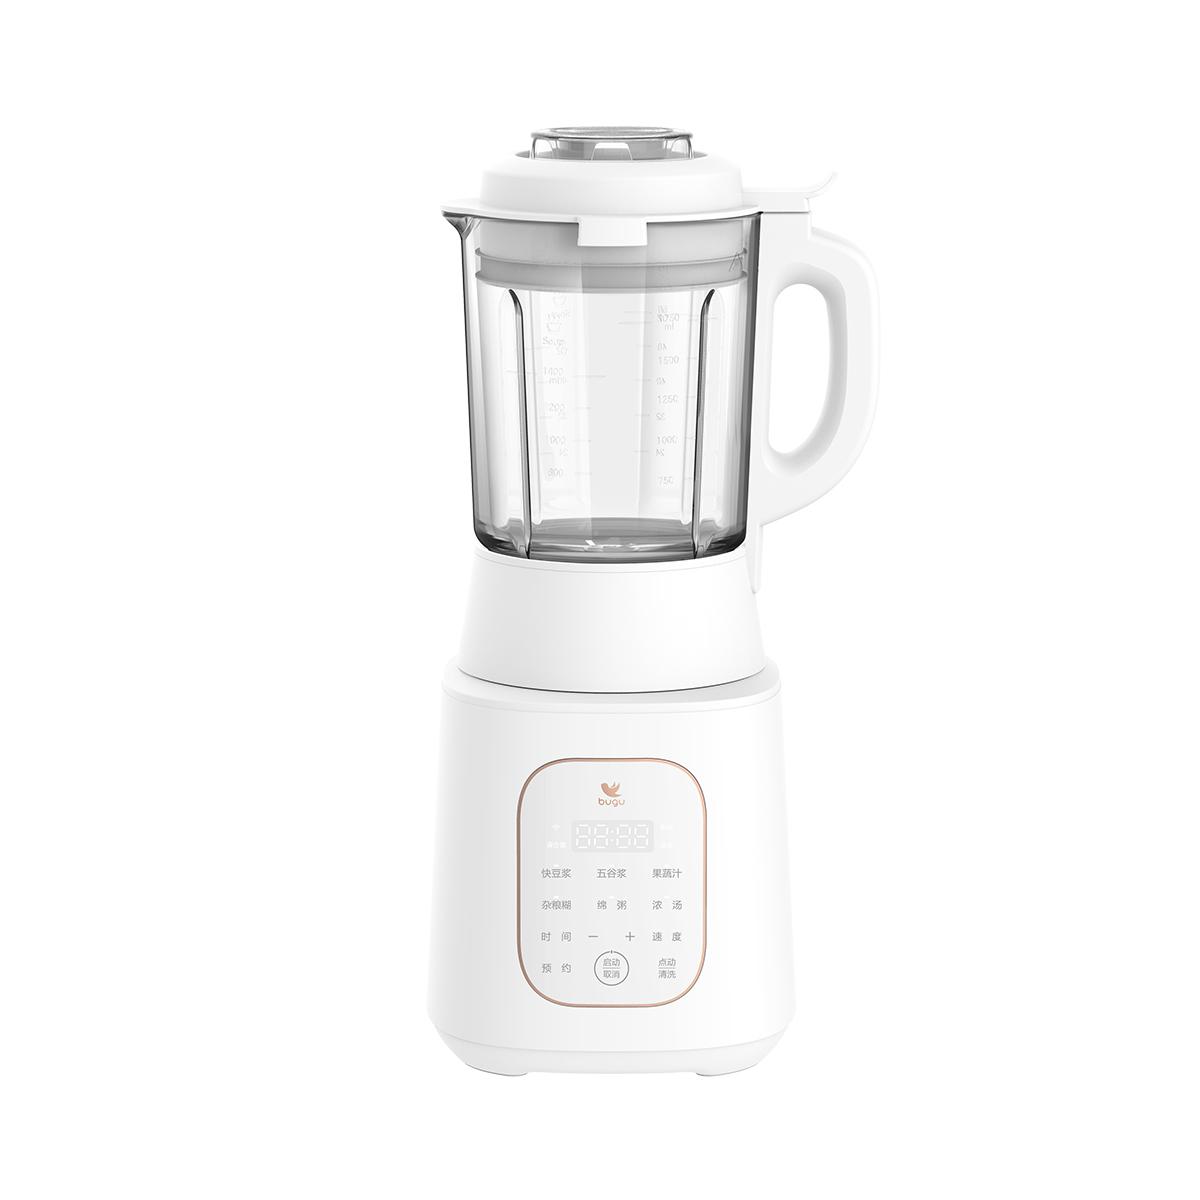 BUGU/布谷 BG-B2搅拌机(料理机) 说明书.pdf